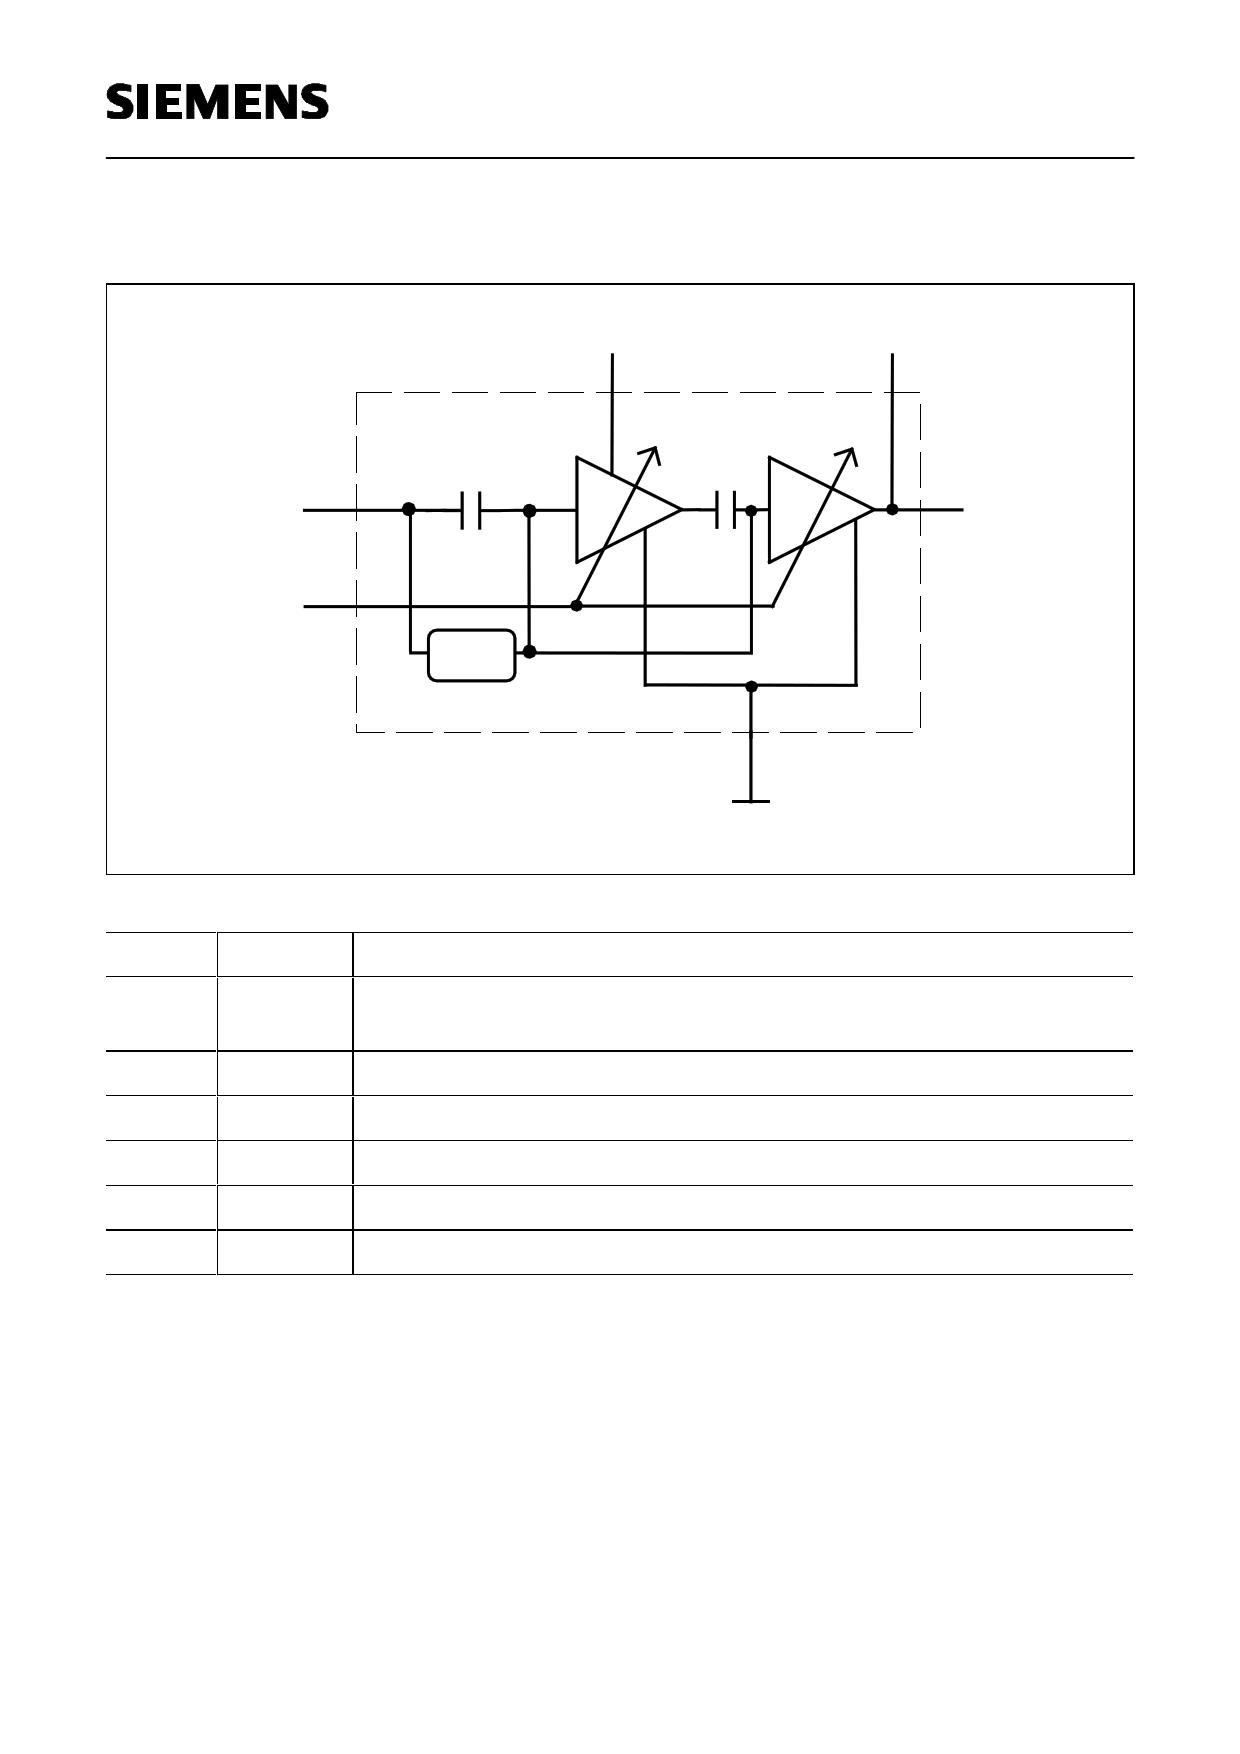 Q-62702-G66 Даташит, Описание, Даташиты